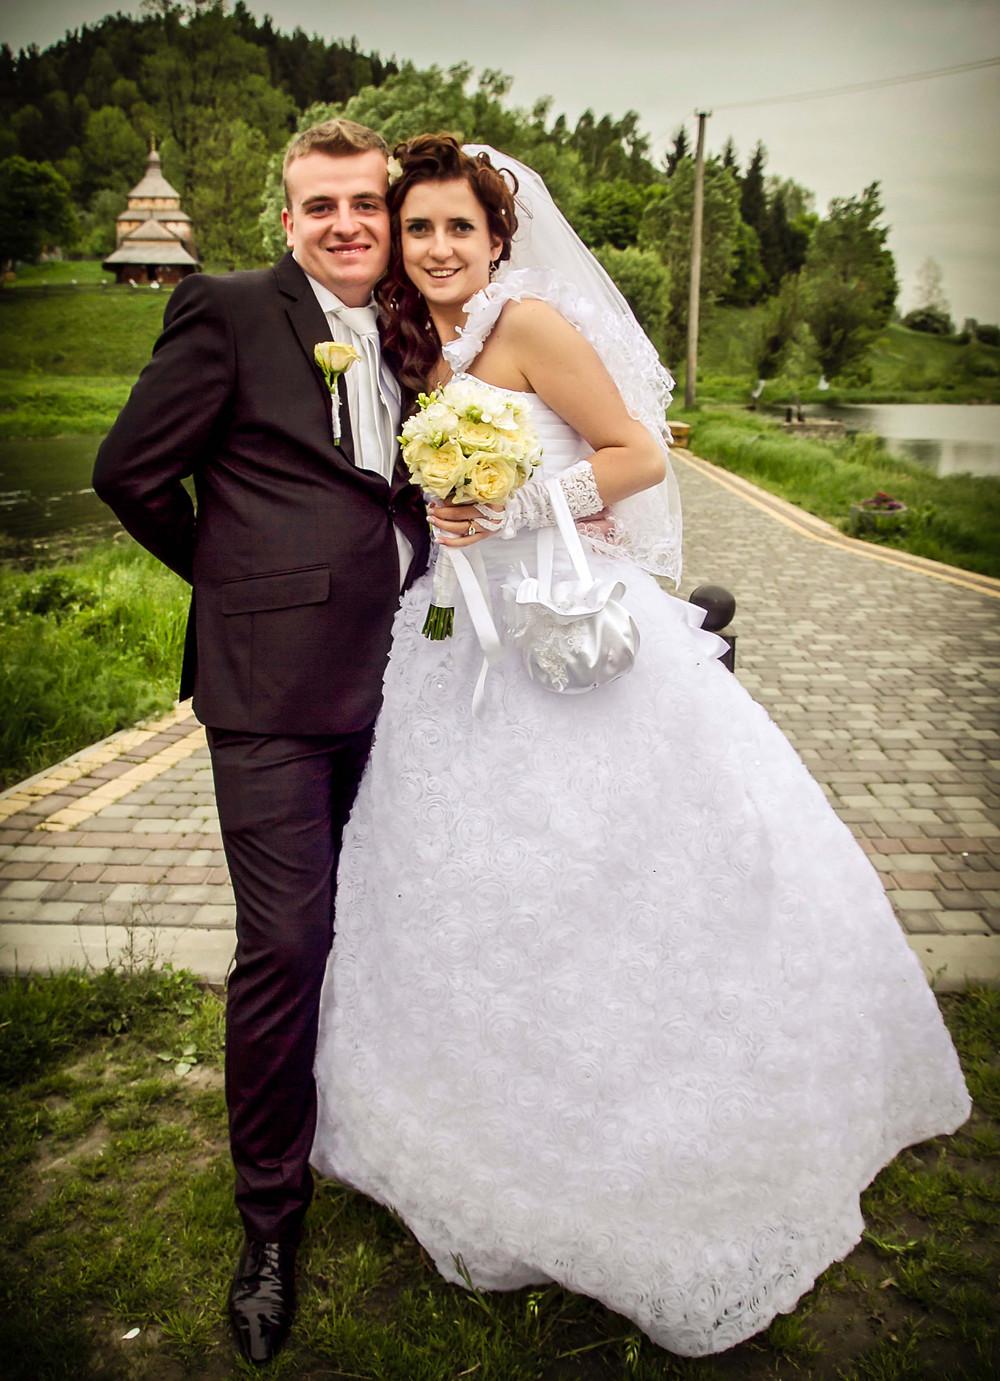 Ślub na Ukrainie